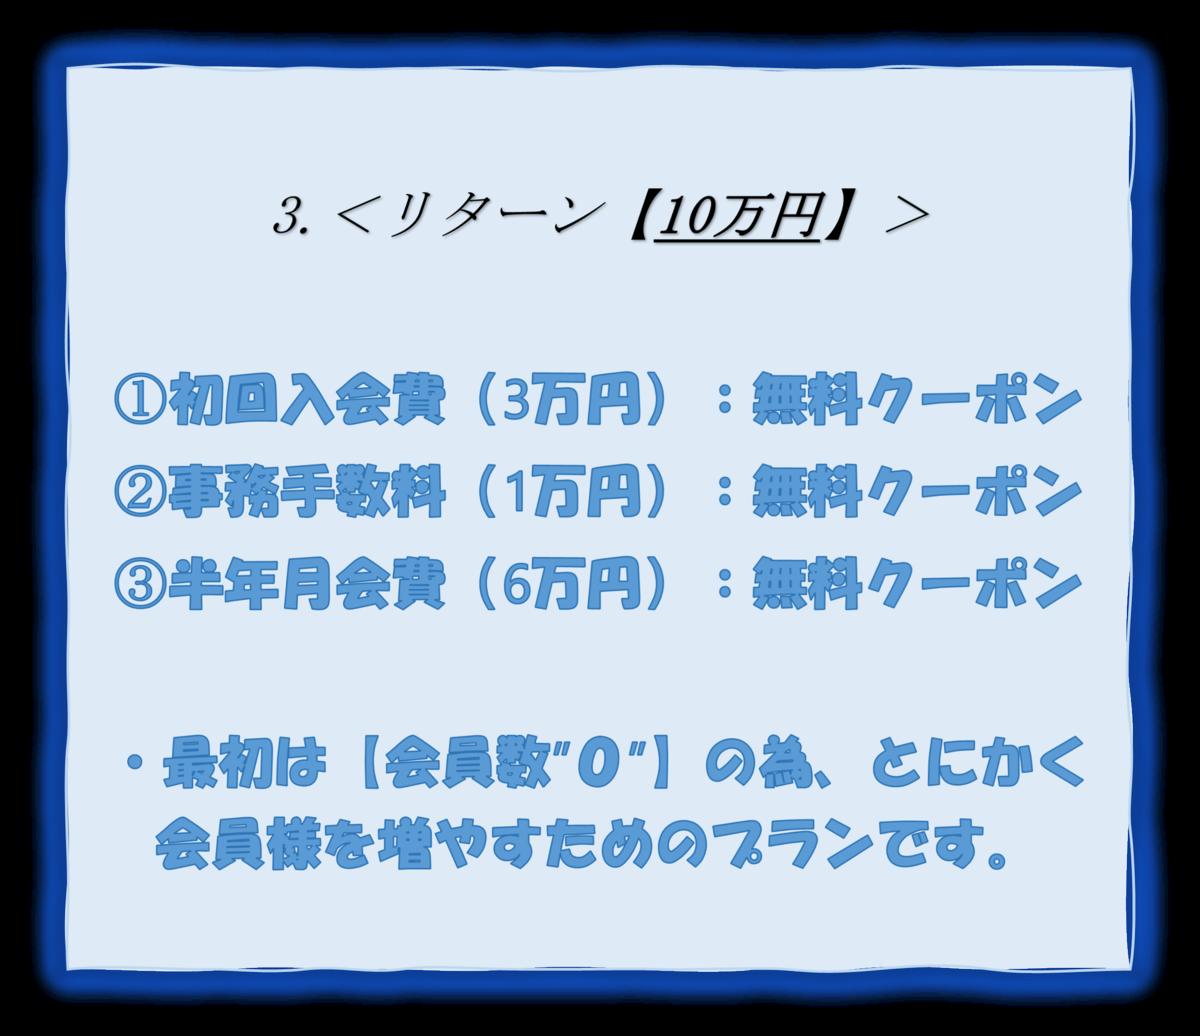 f:id:tsubasatyann:20210424110100p:plain